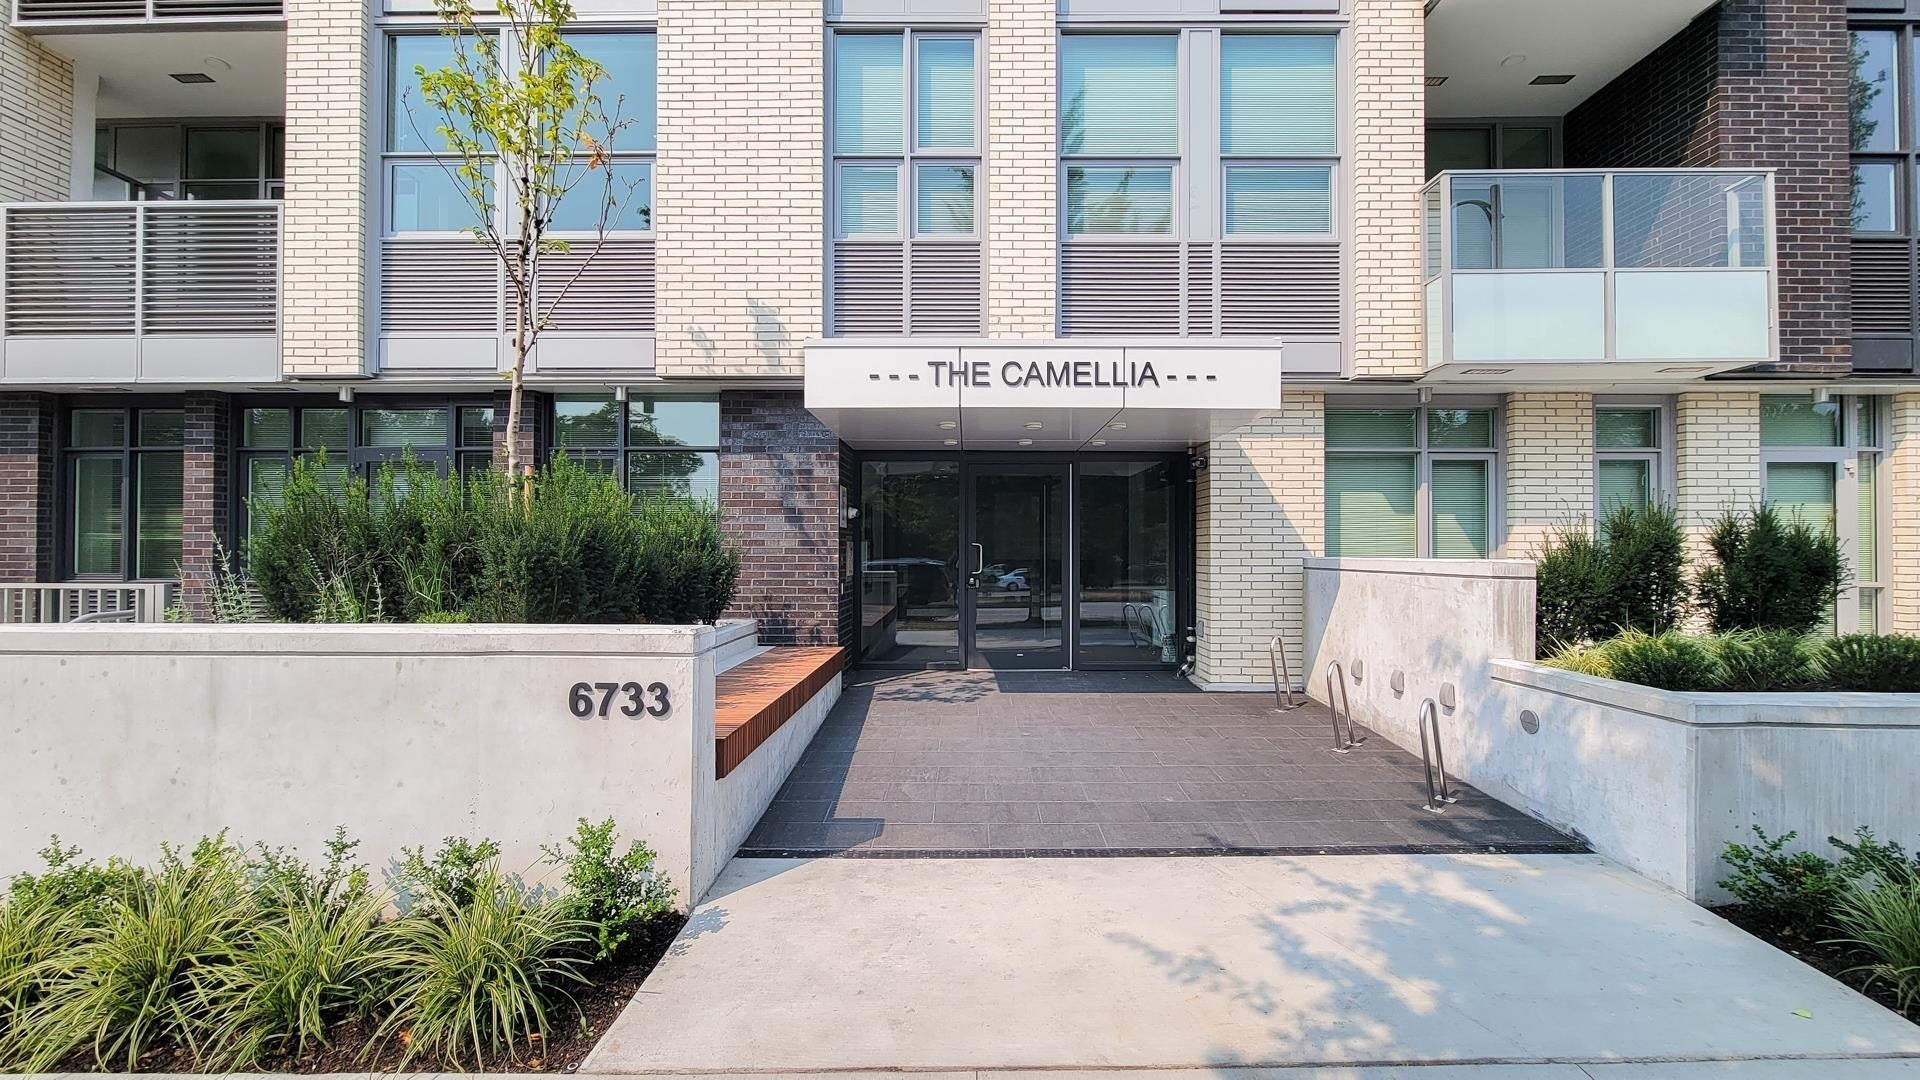 310 6721 CAMBIE STREET - Oakridge VW Apartment/Condo for sale, 1 Bedroom (R2619567)